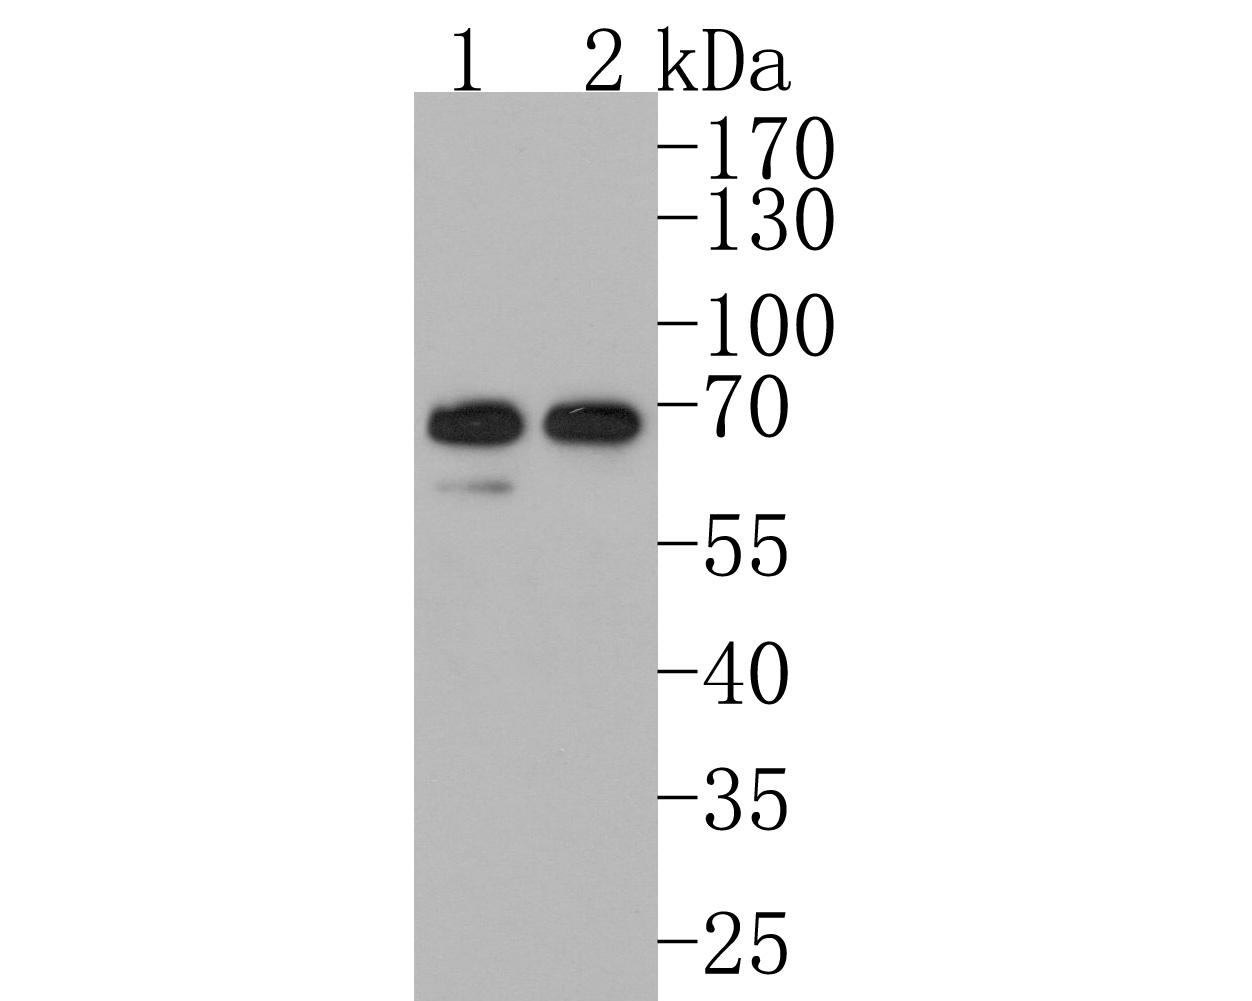 Western blot analysis of FUBP1 on different lysates using anti-FUBP1 antibody at 1/1,000 dilution. Positive control:    Lane 1: Hela                  Lane 2: Raji